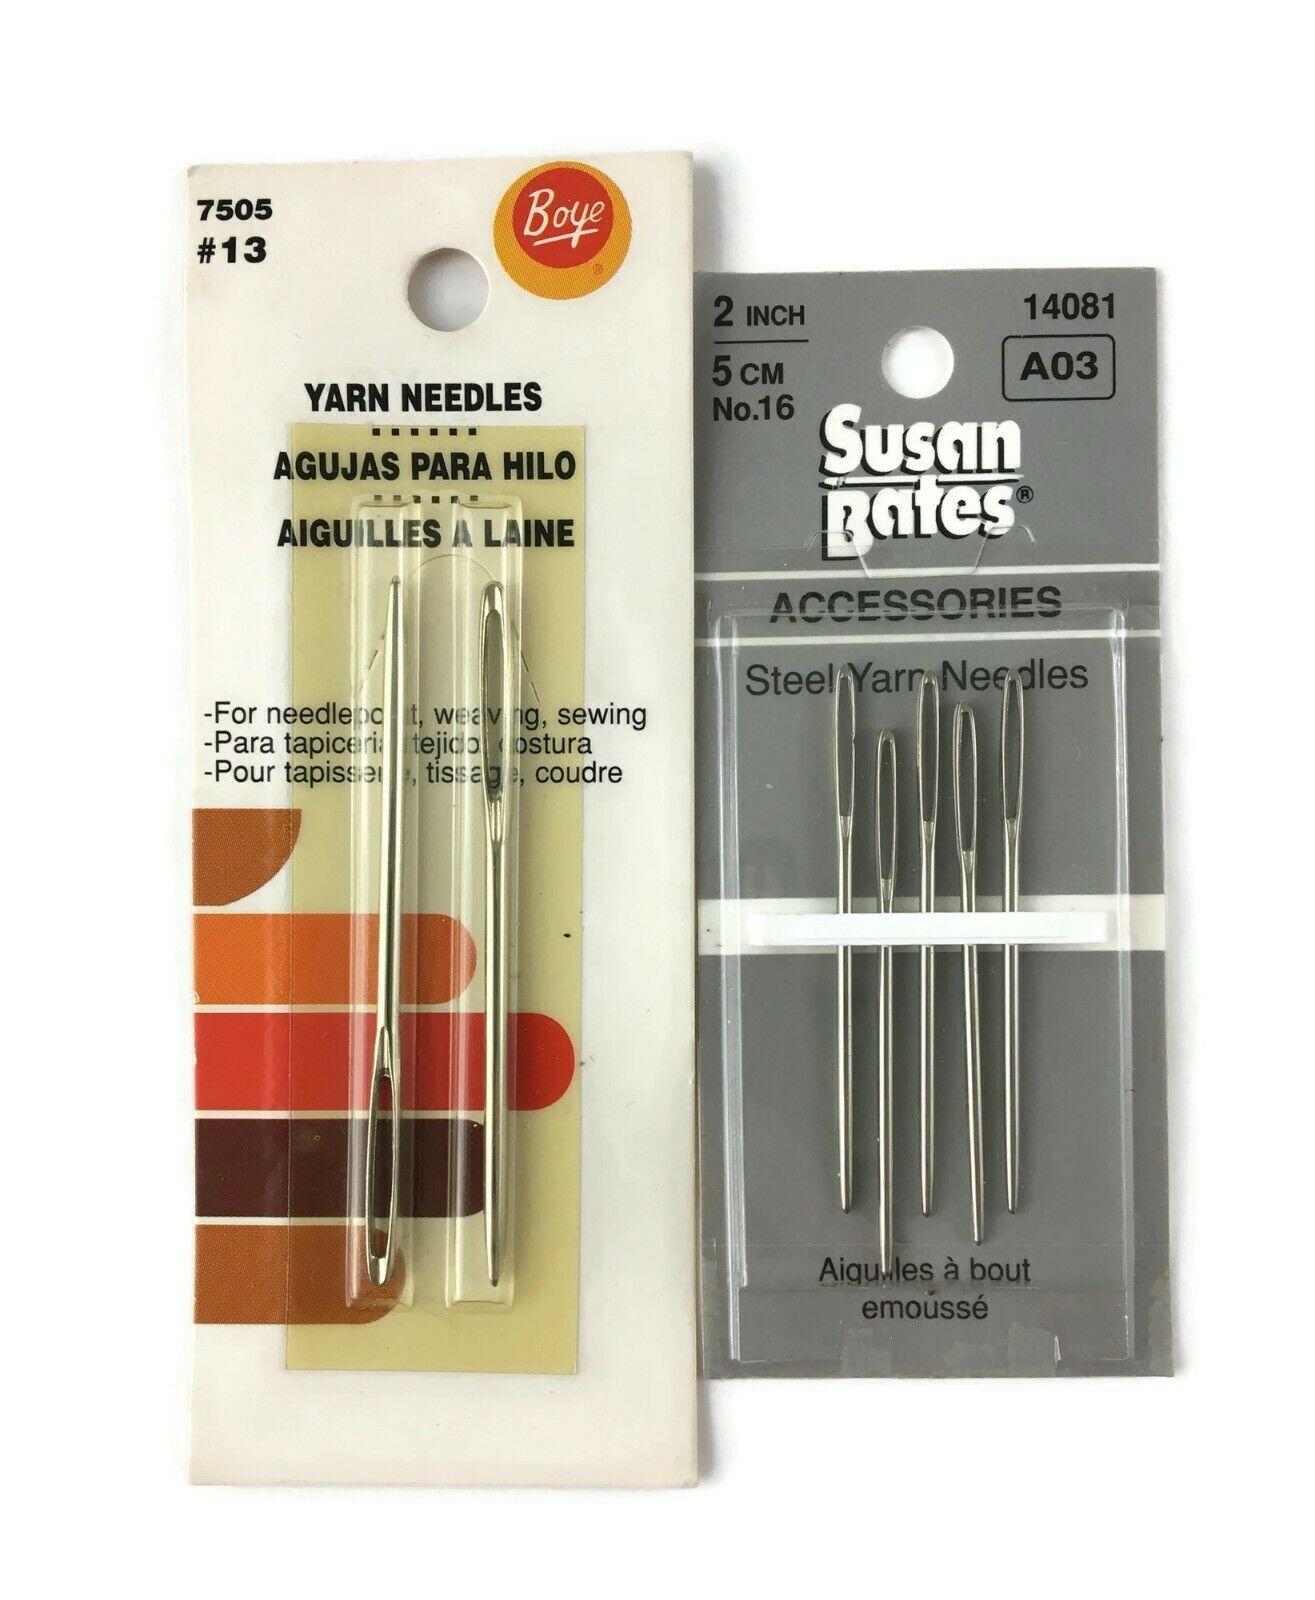 Lot of 7 NOS STEEL YARN NEEDLES 2 & 2.5 INCHES Boye #13 SUSAN BATES #16 Knitting - $14.84